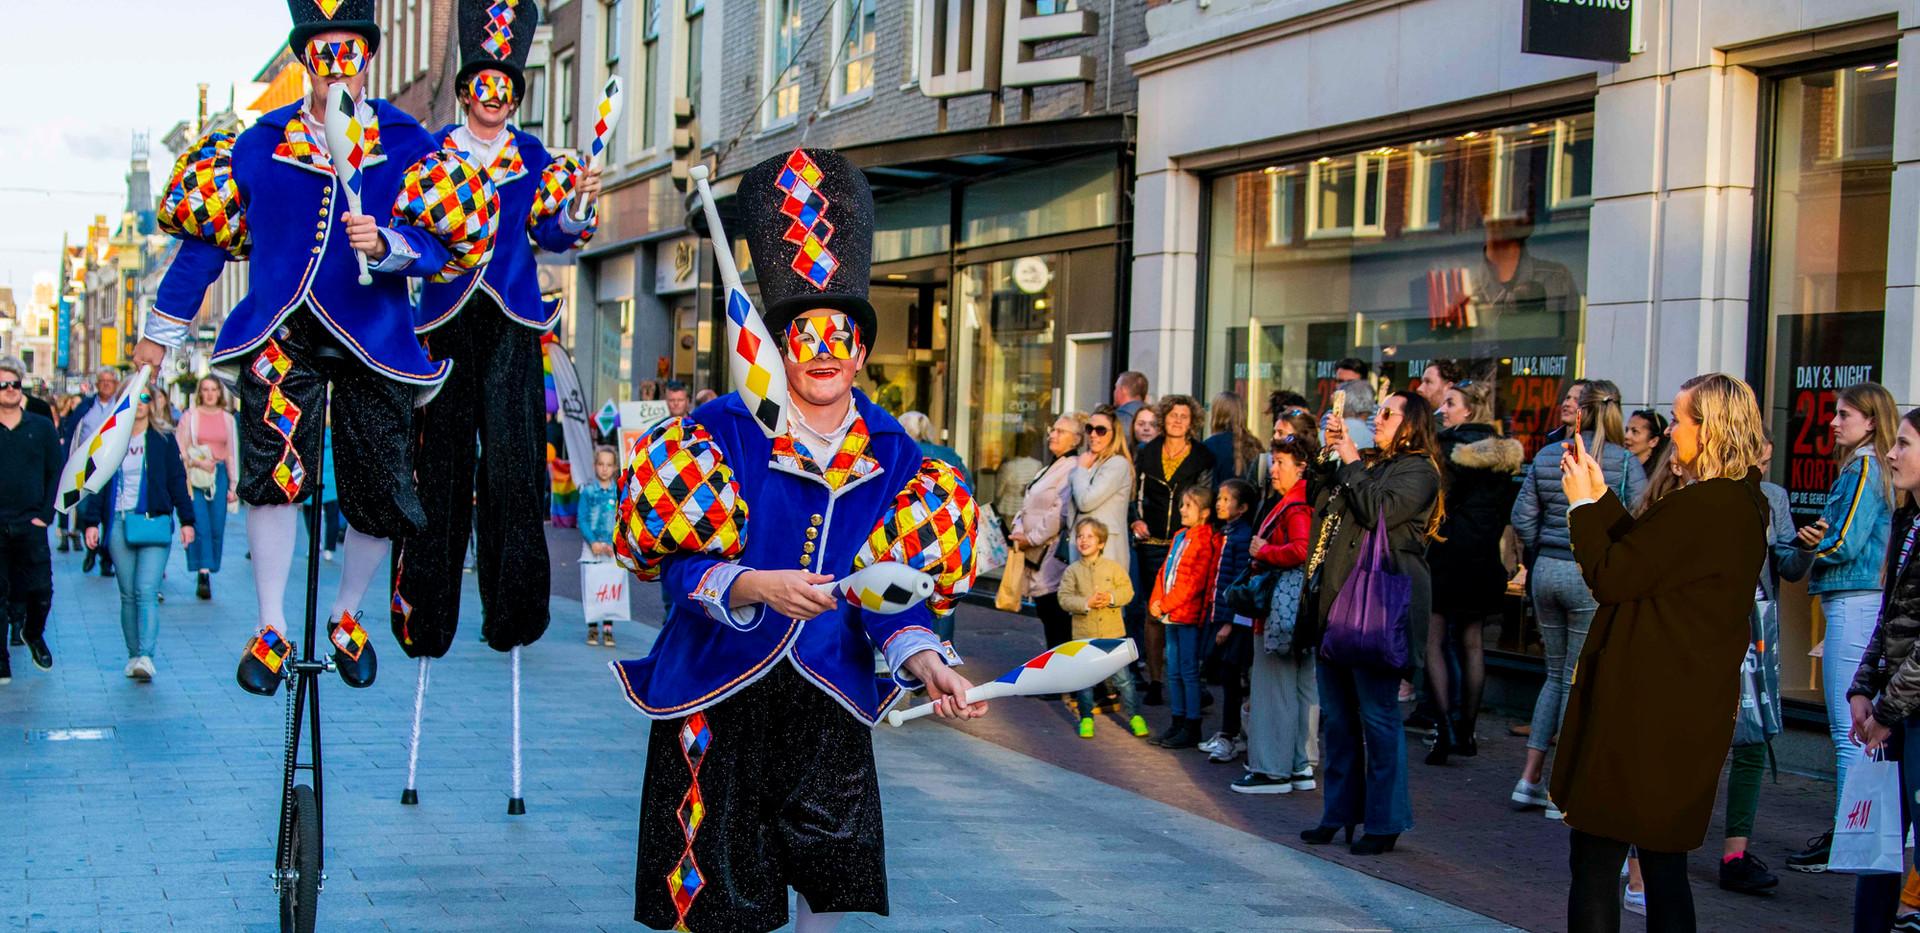 Cirque_Masque_parade_publiek_audience_jo